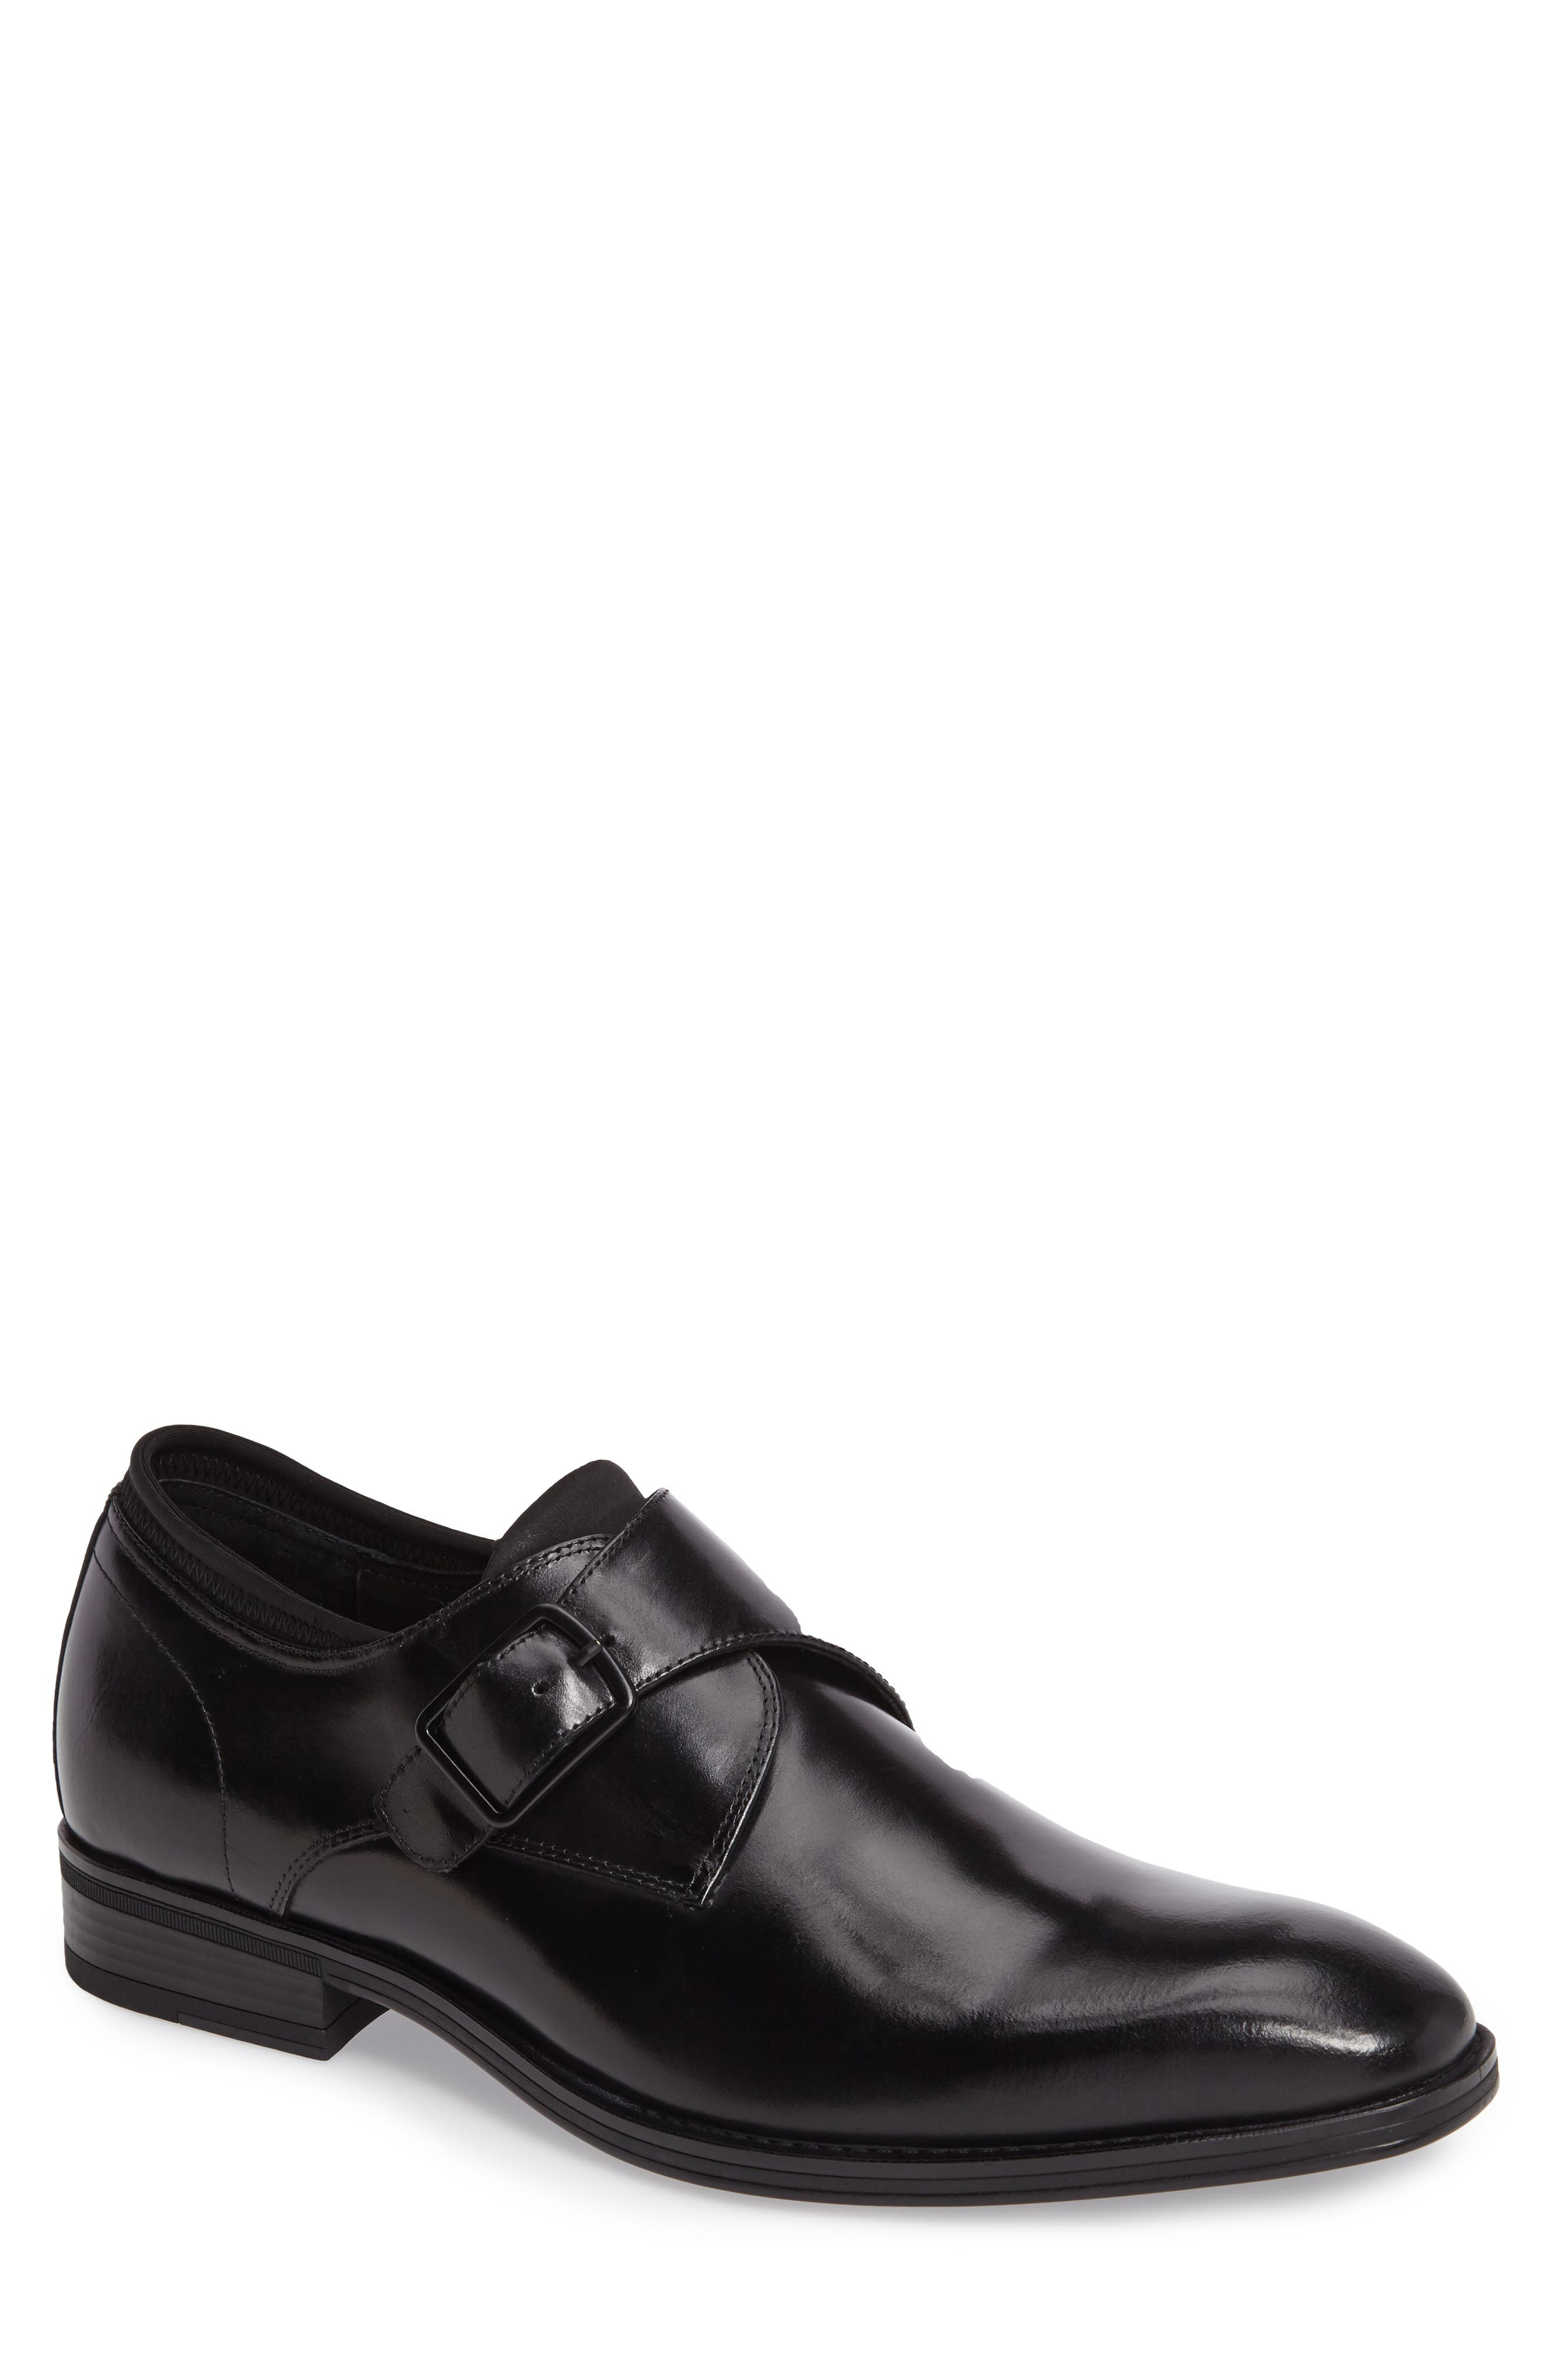 Alternate Image 1 Selected - Kenneth Cole New York Shock Wave Monk Shoe (Men)